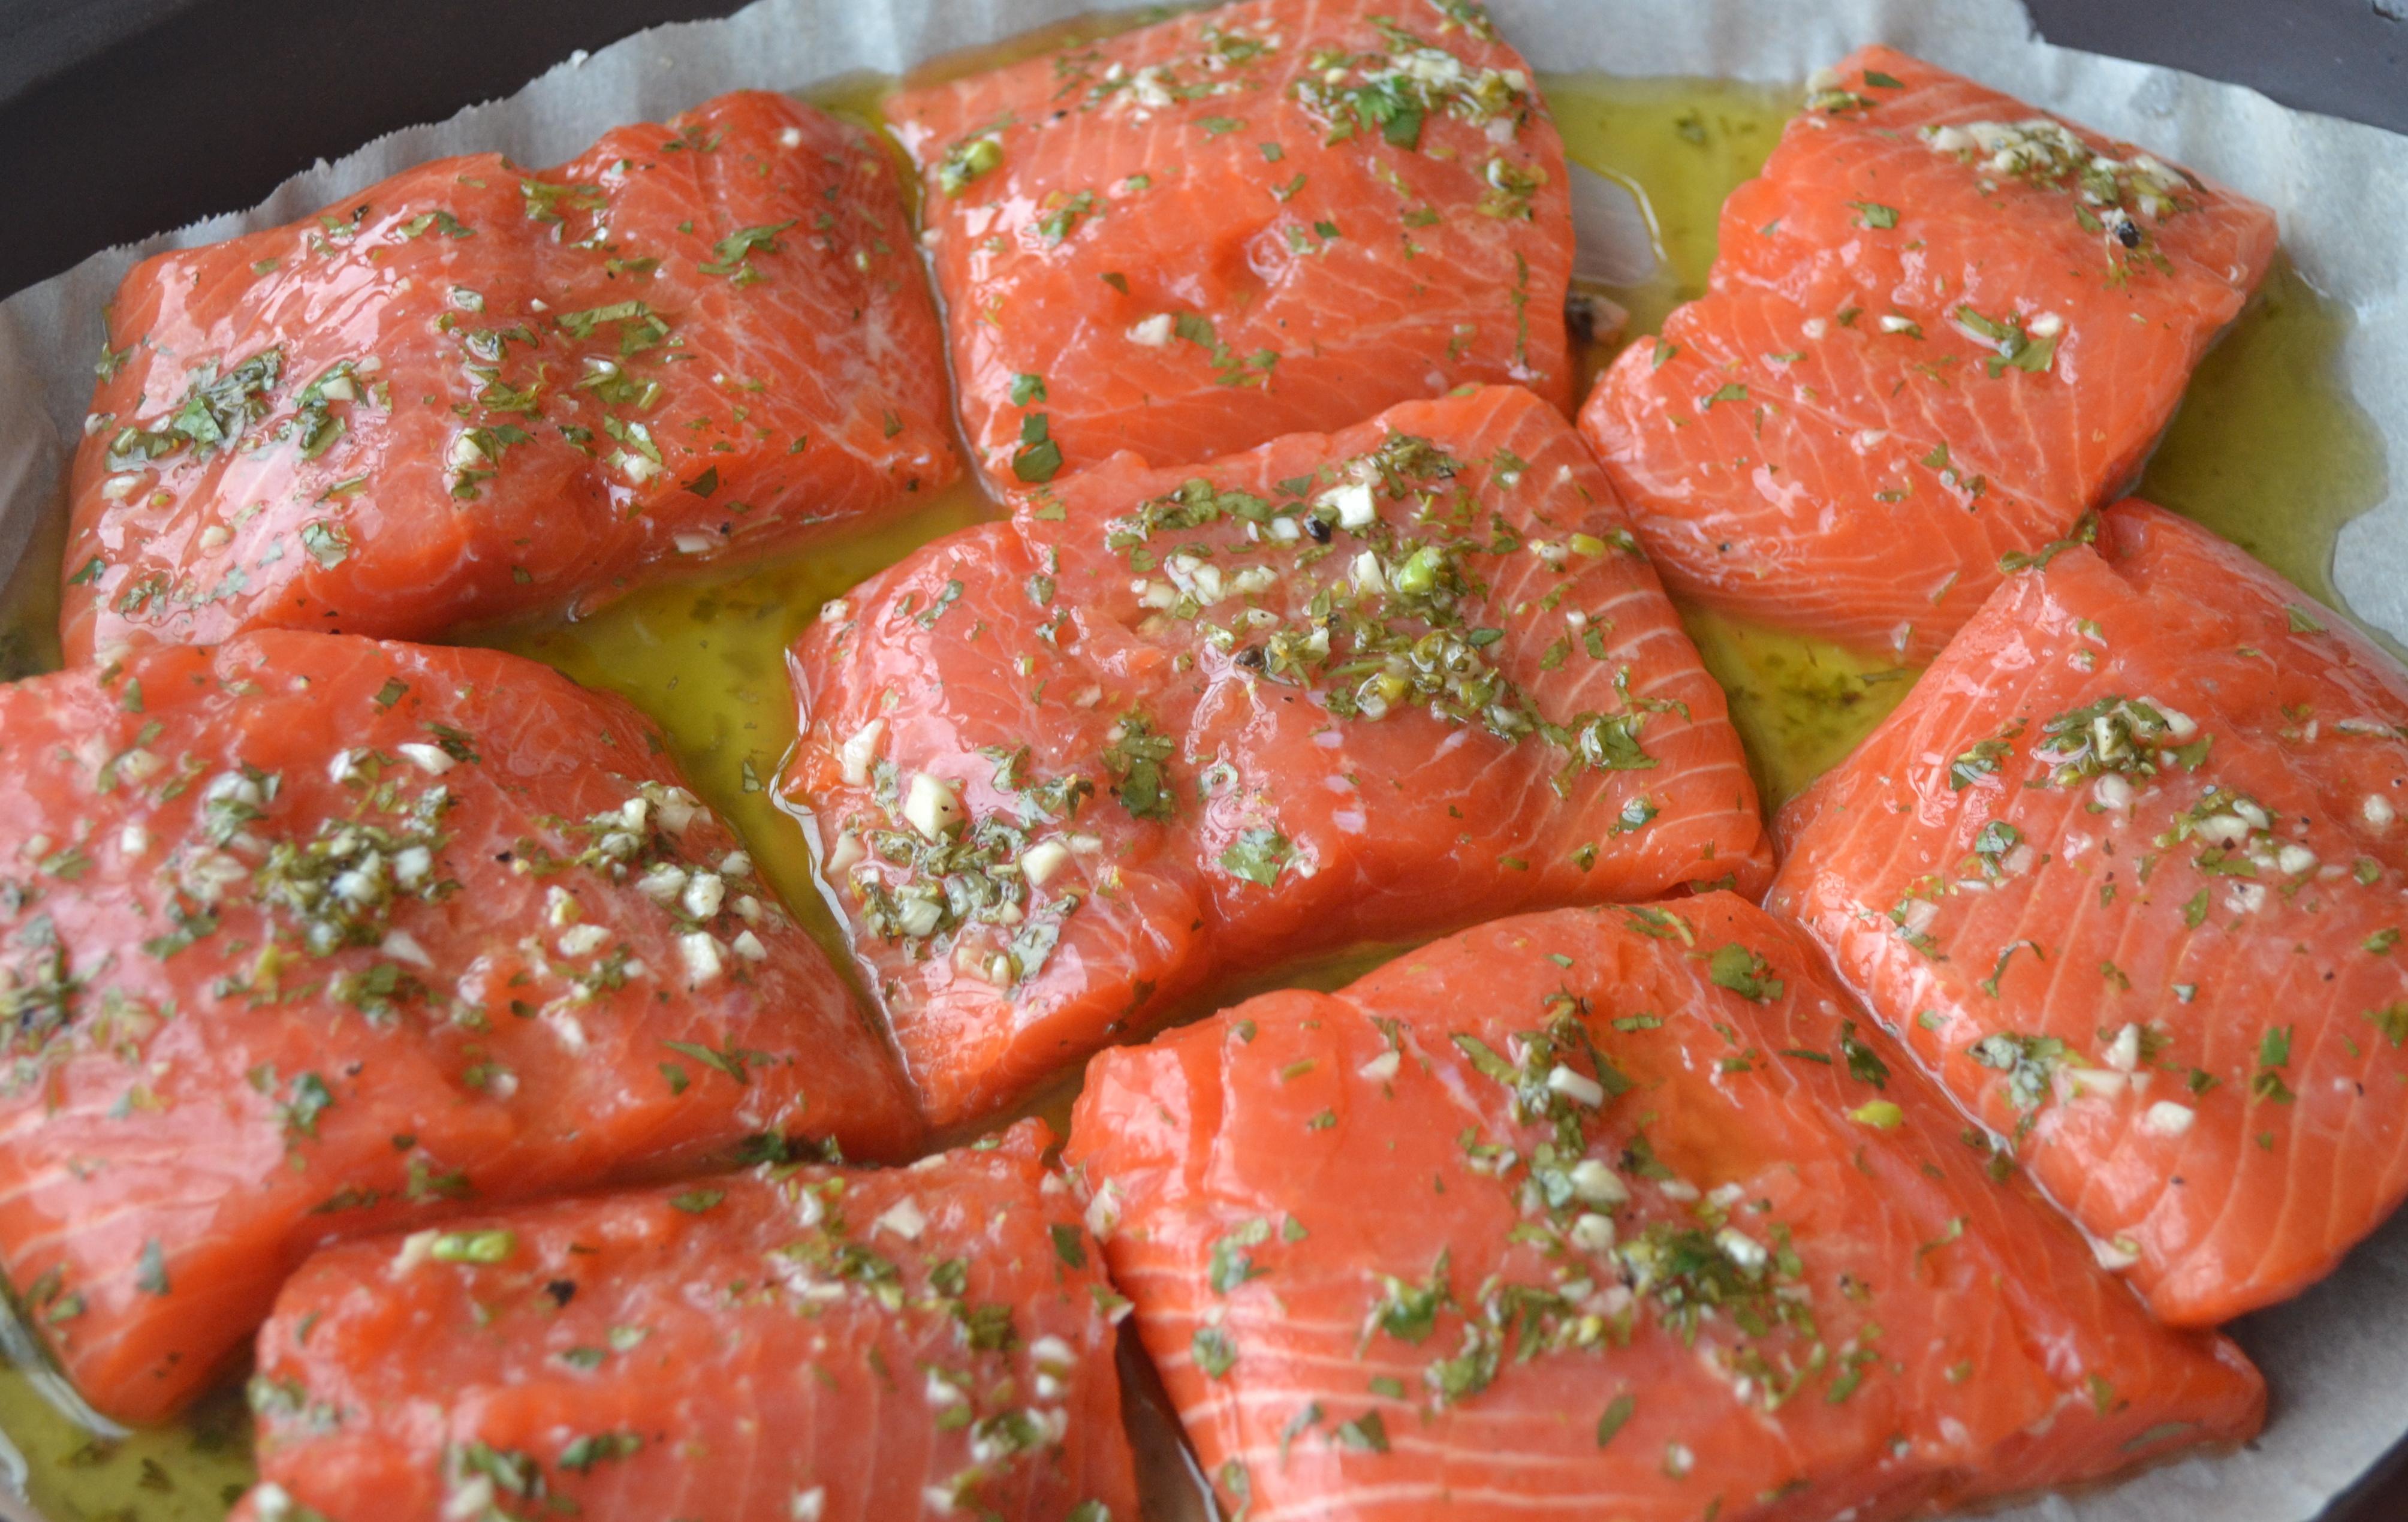 Salmon Nourishing Vancouver